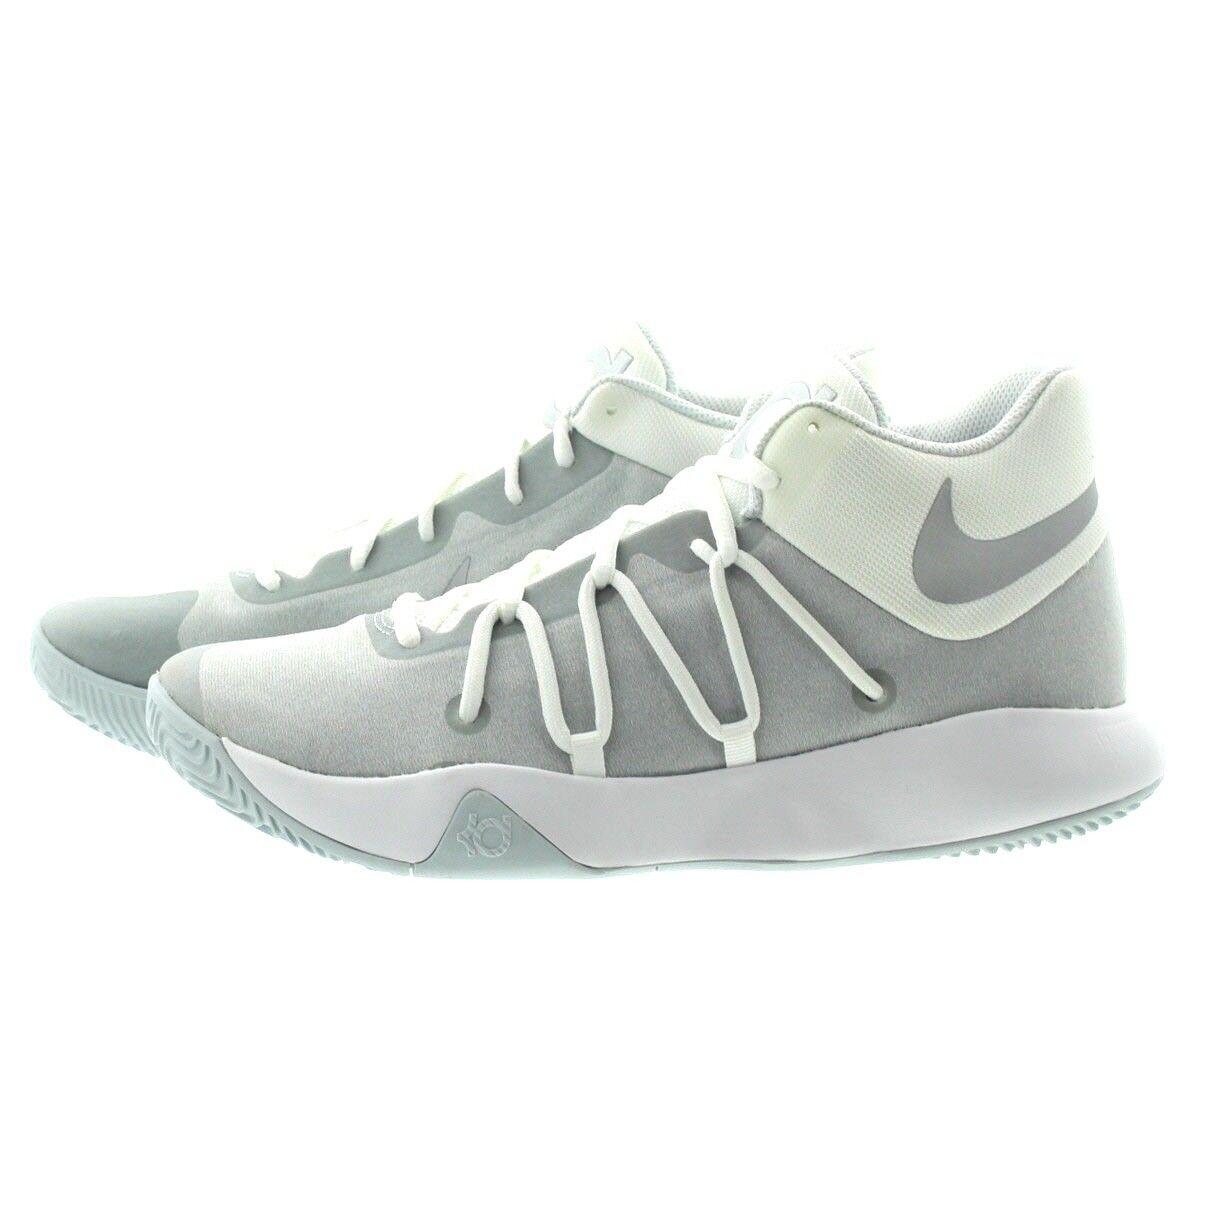 Nike 897638 Uomo Uomo Uomo Uomo Uomo kevin durant trey 5 bassa cima scarpe da   c2d304